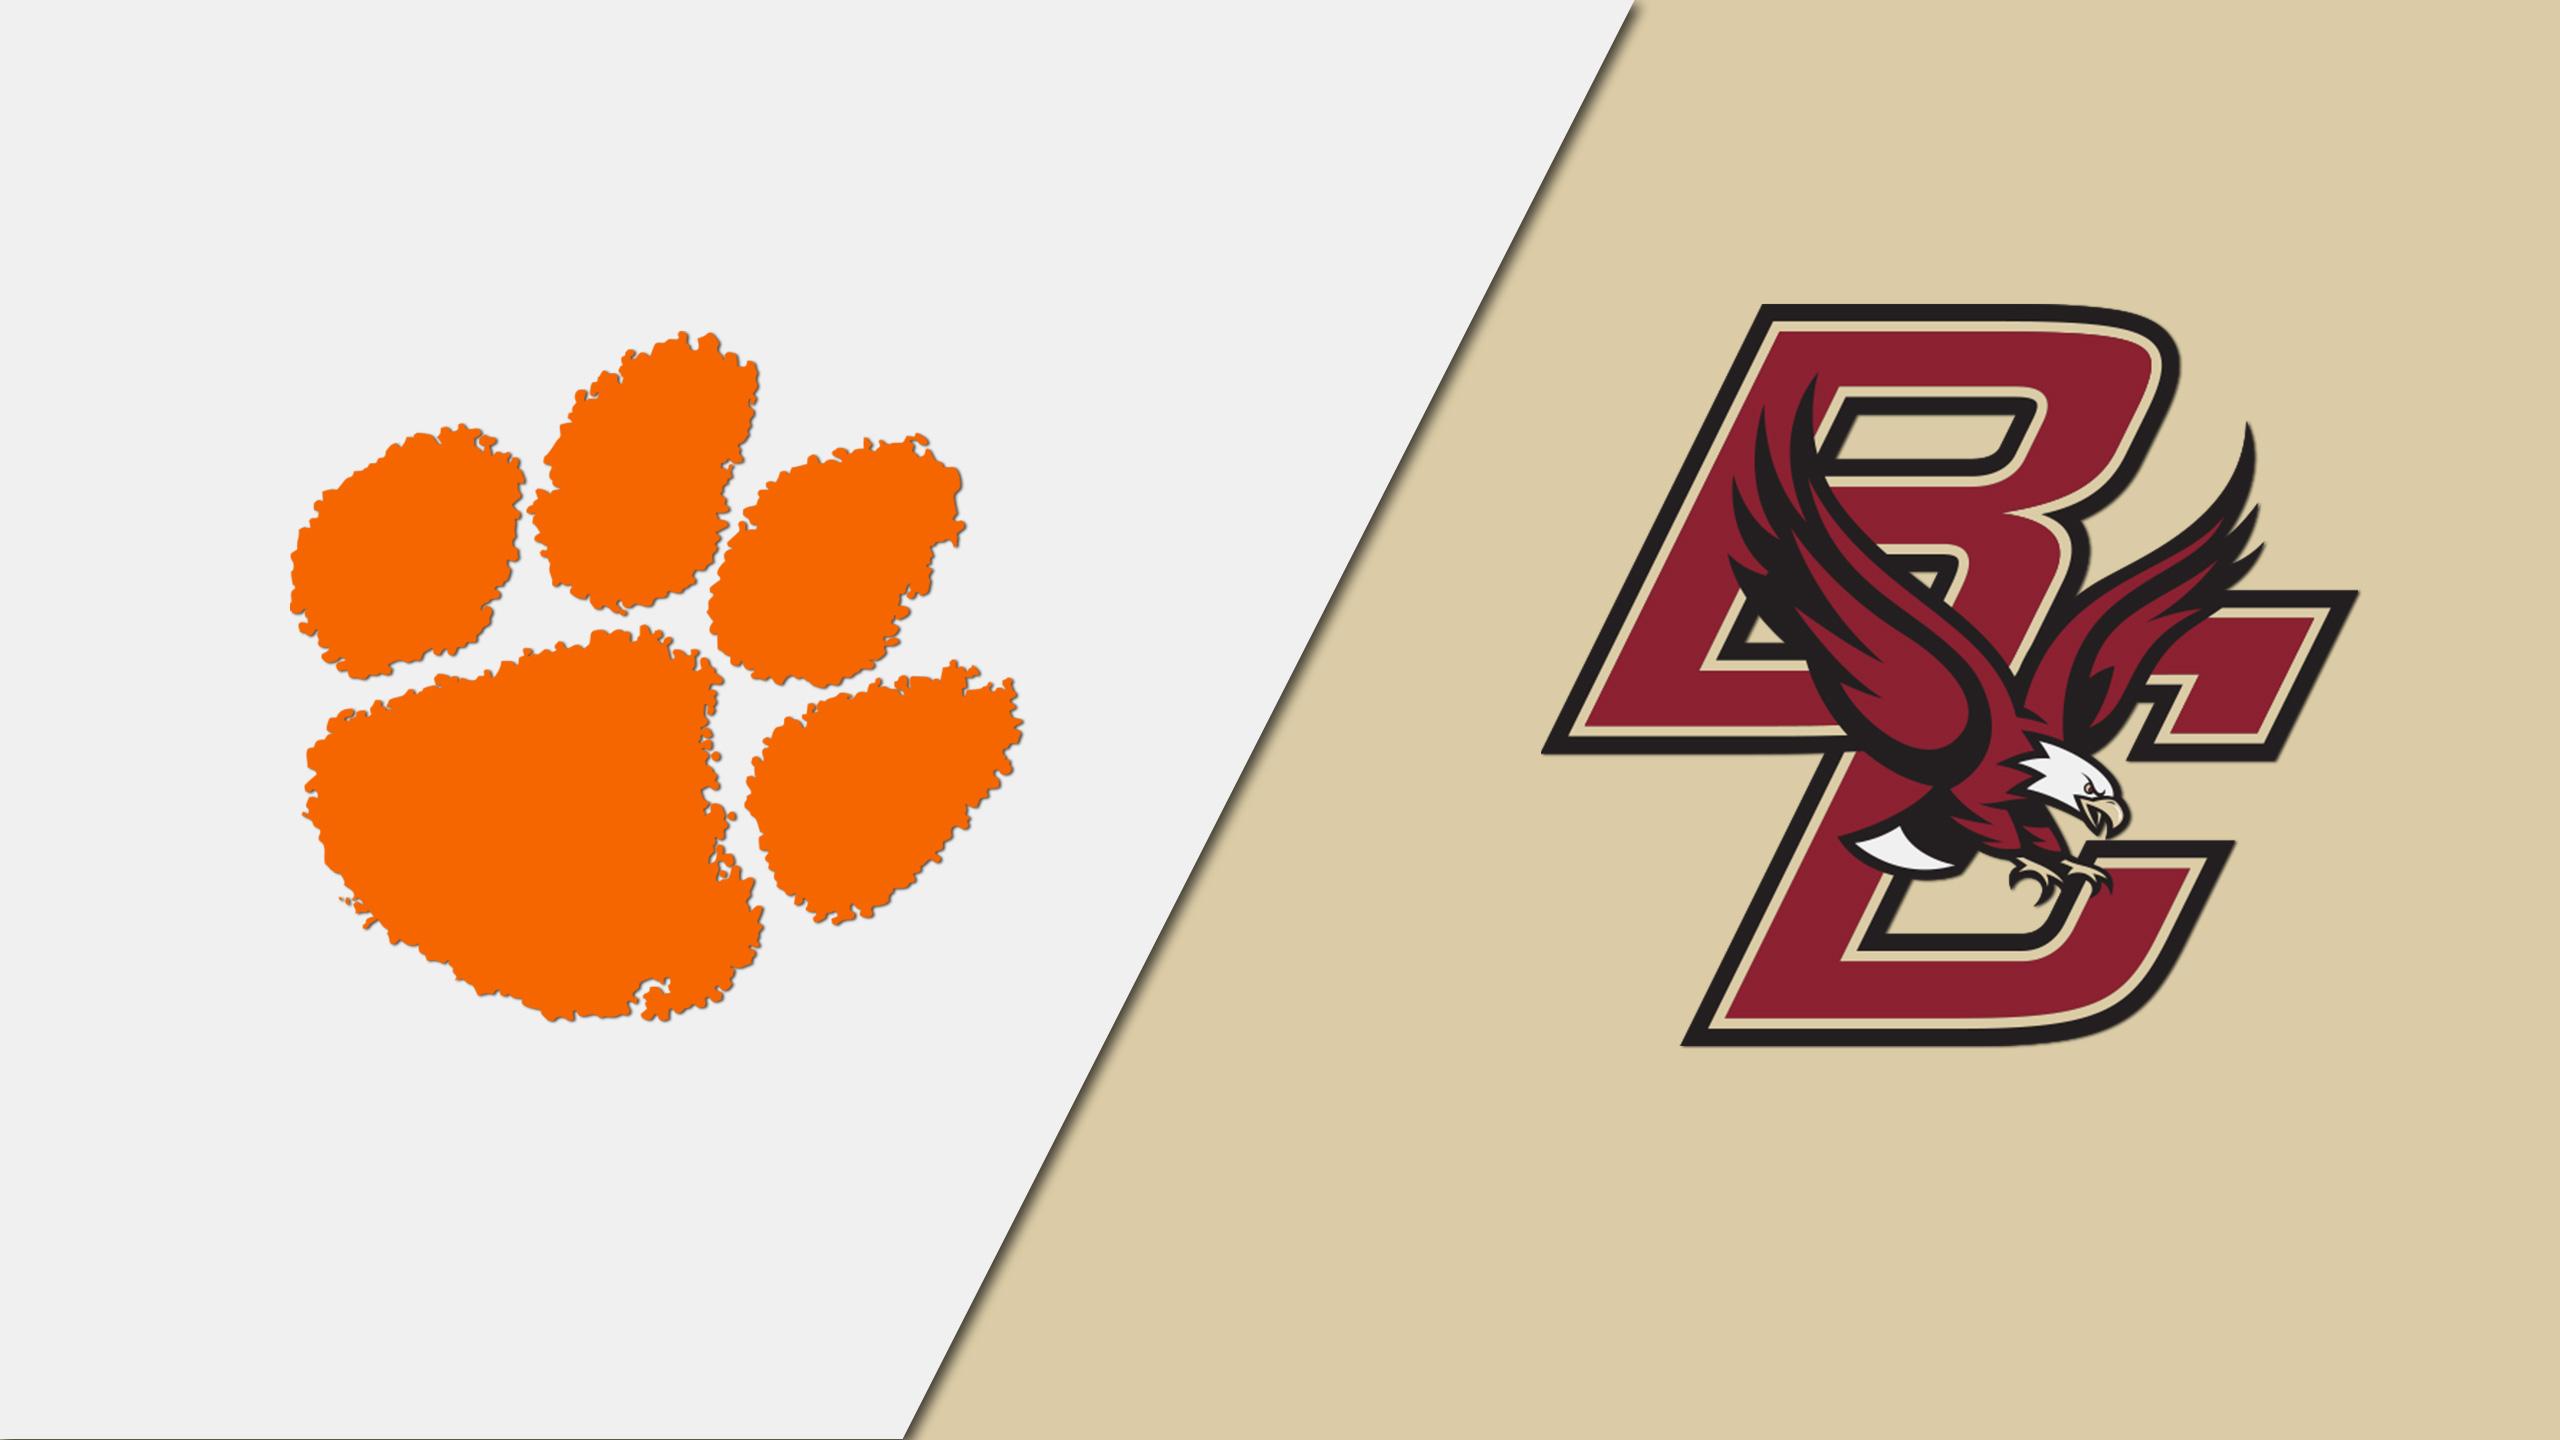 Clemson vs. Boston College (W Basketball)